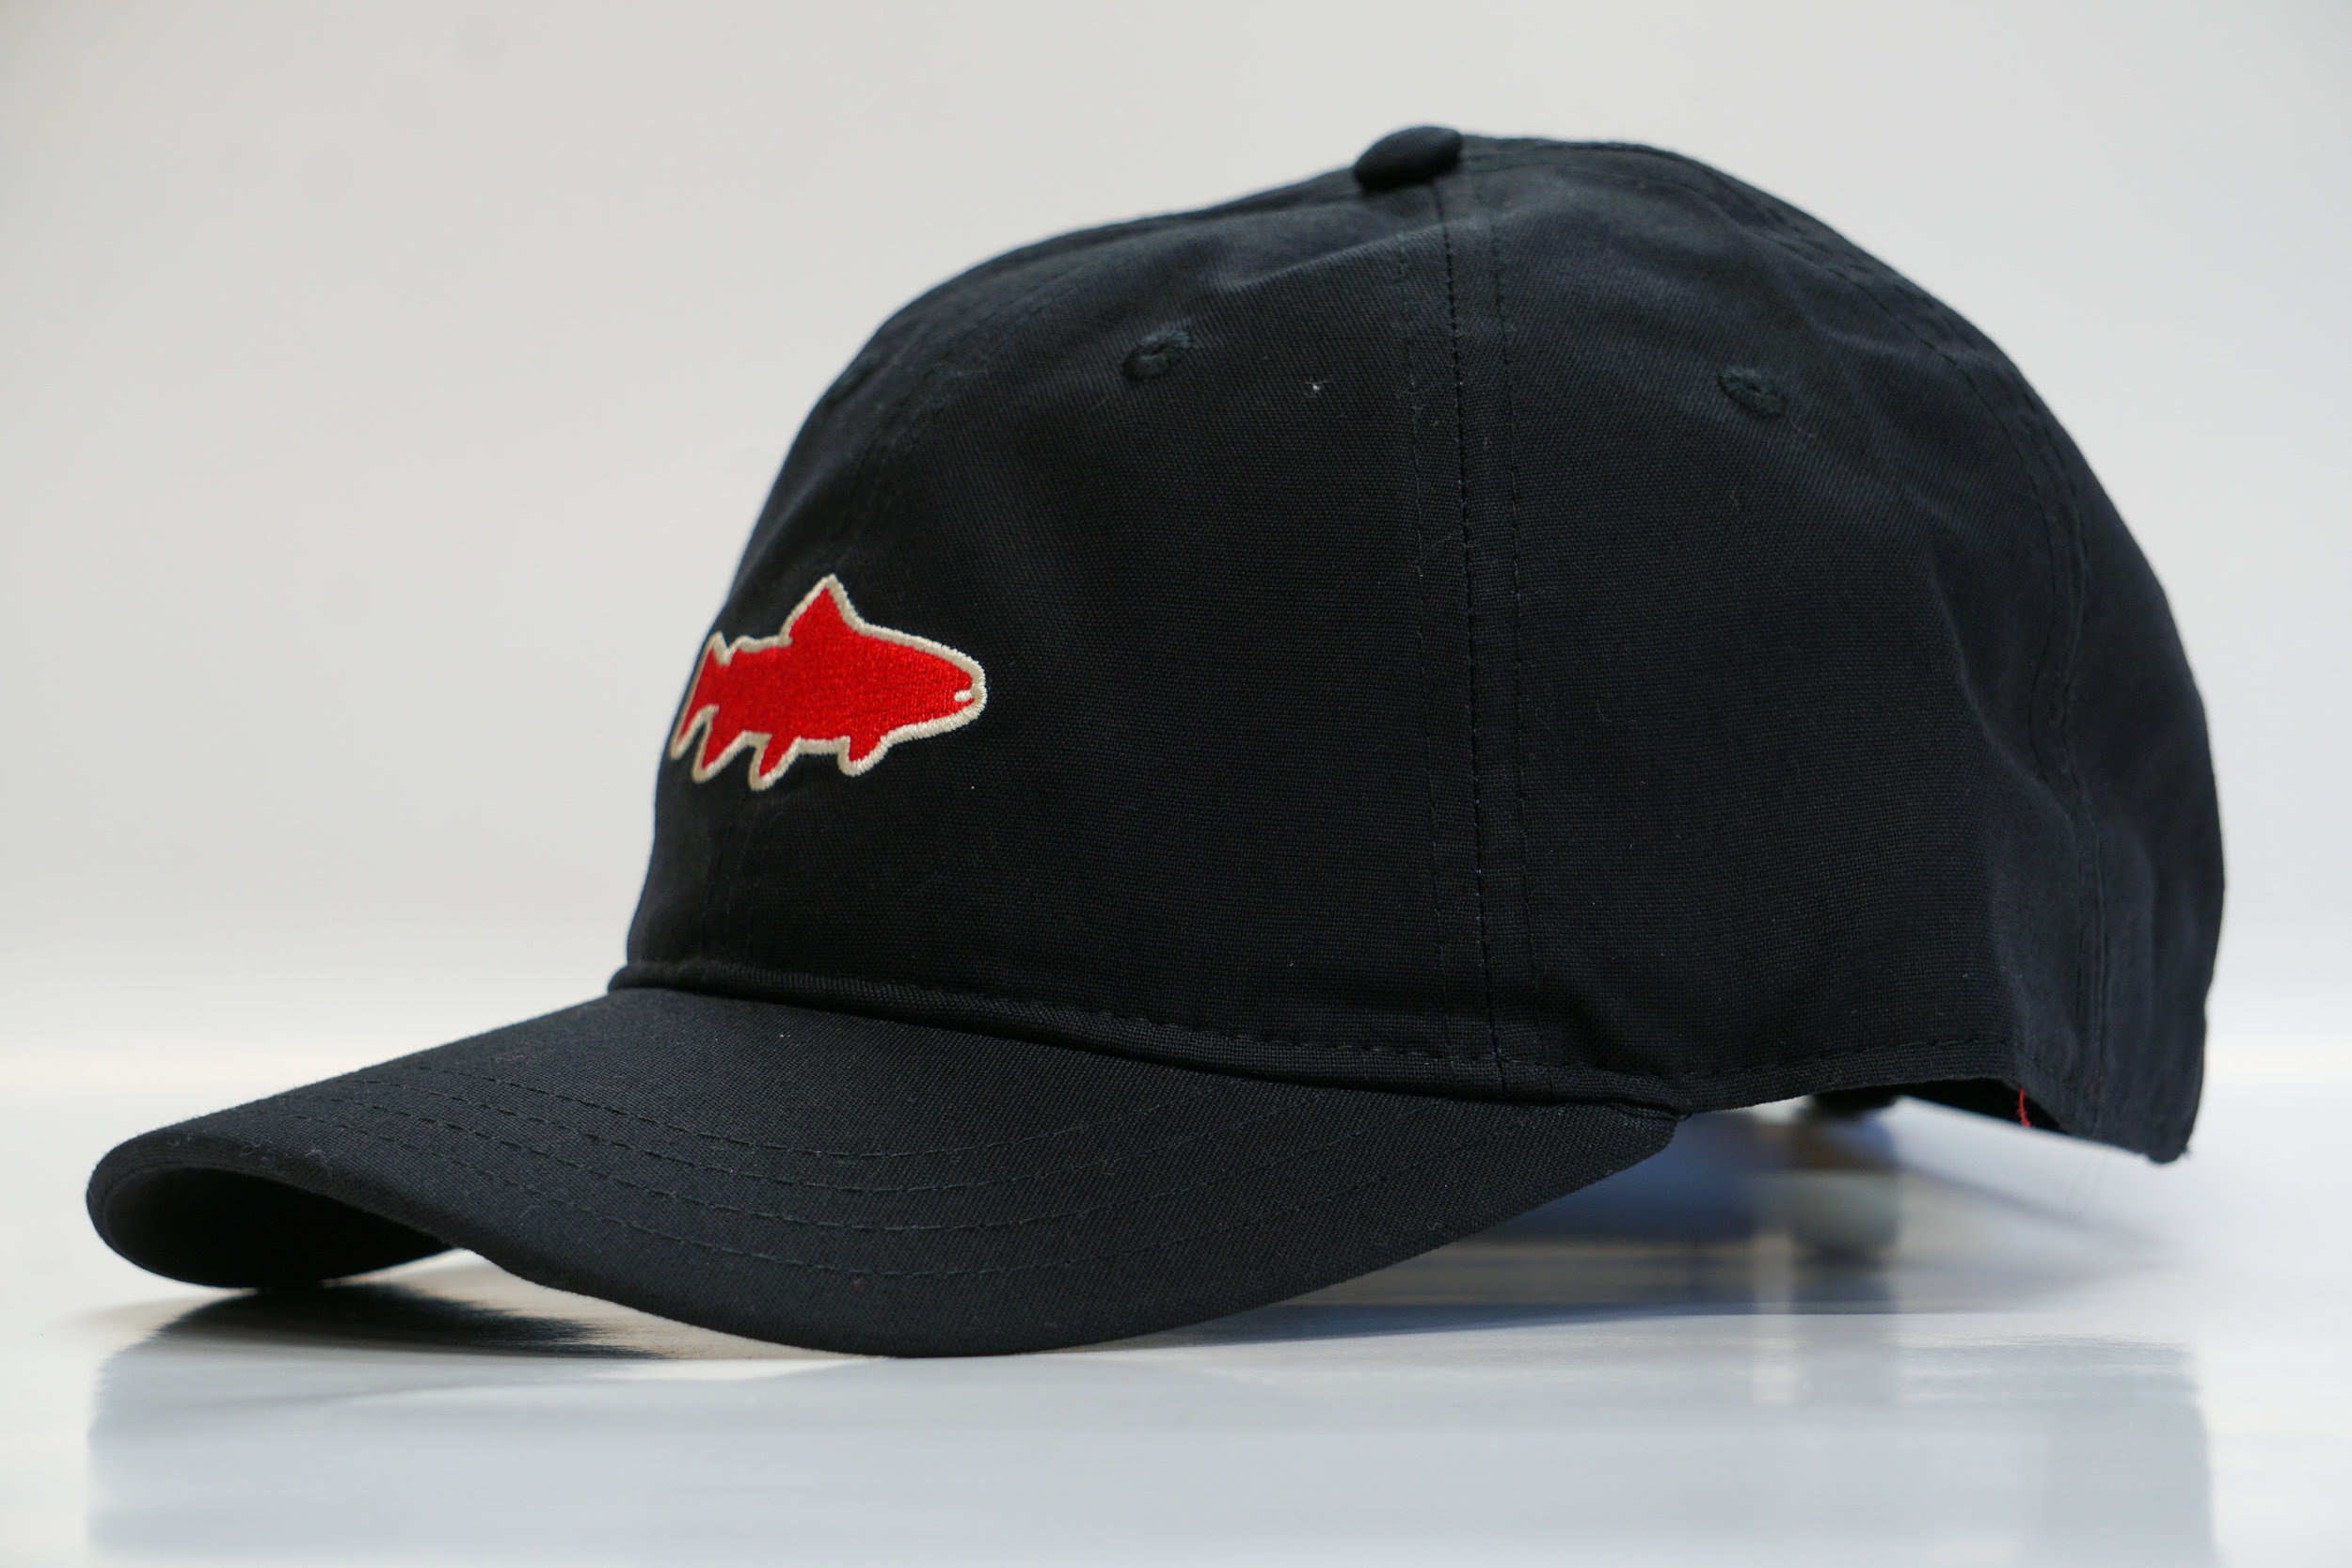 ed6278e28e3 Yewchati Dawgs Trout Hat - Black — Yewchati Co.